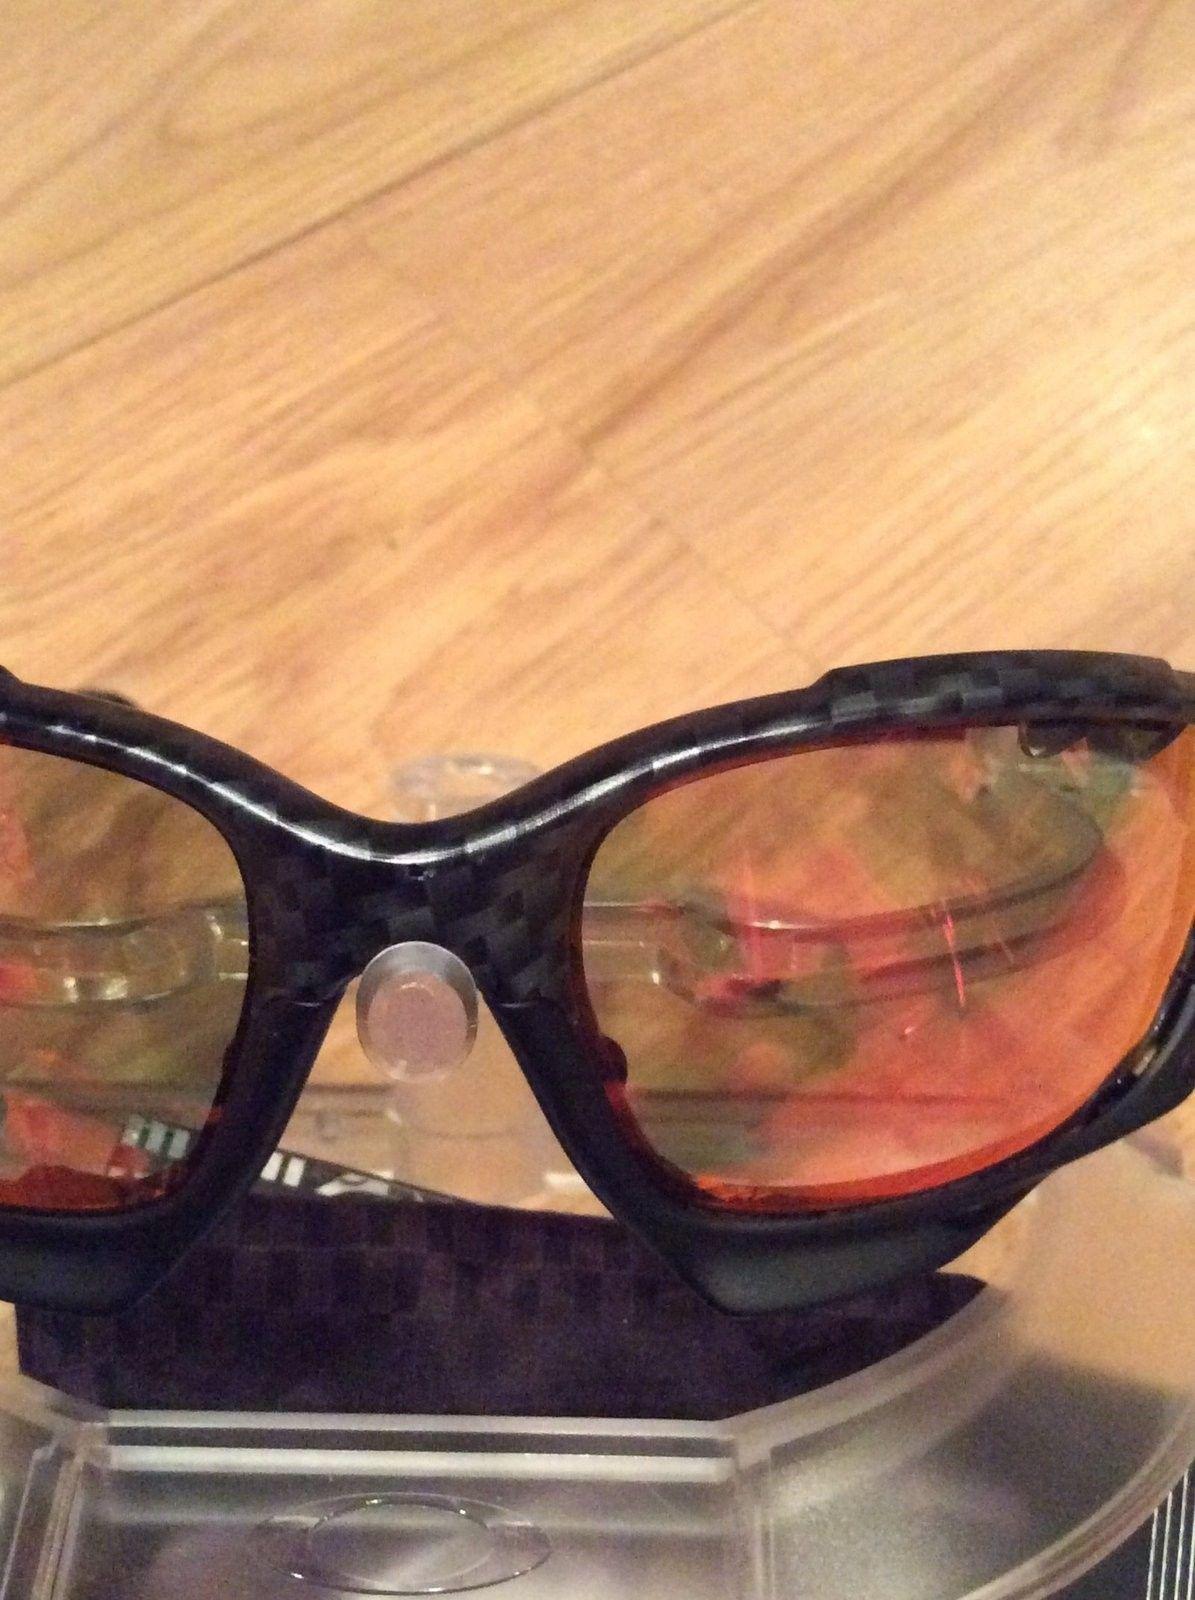 BNIB Echelon Jawbone $300 shipped - image.jpg